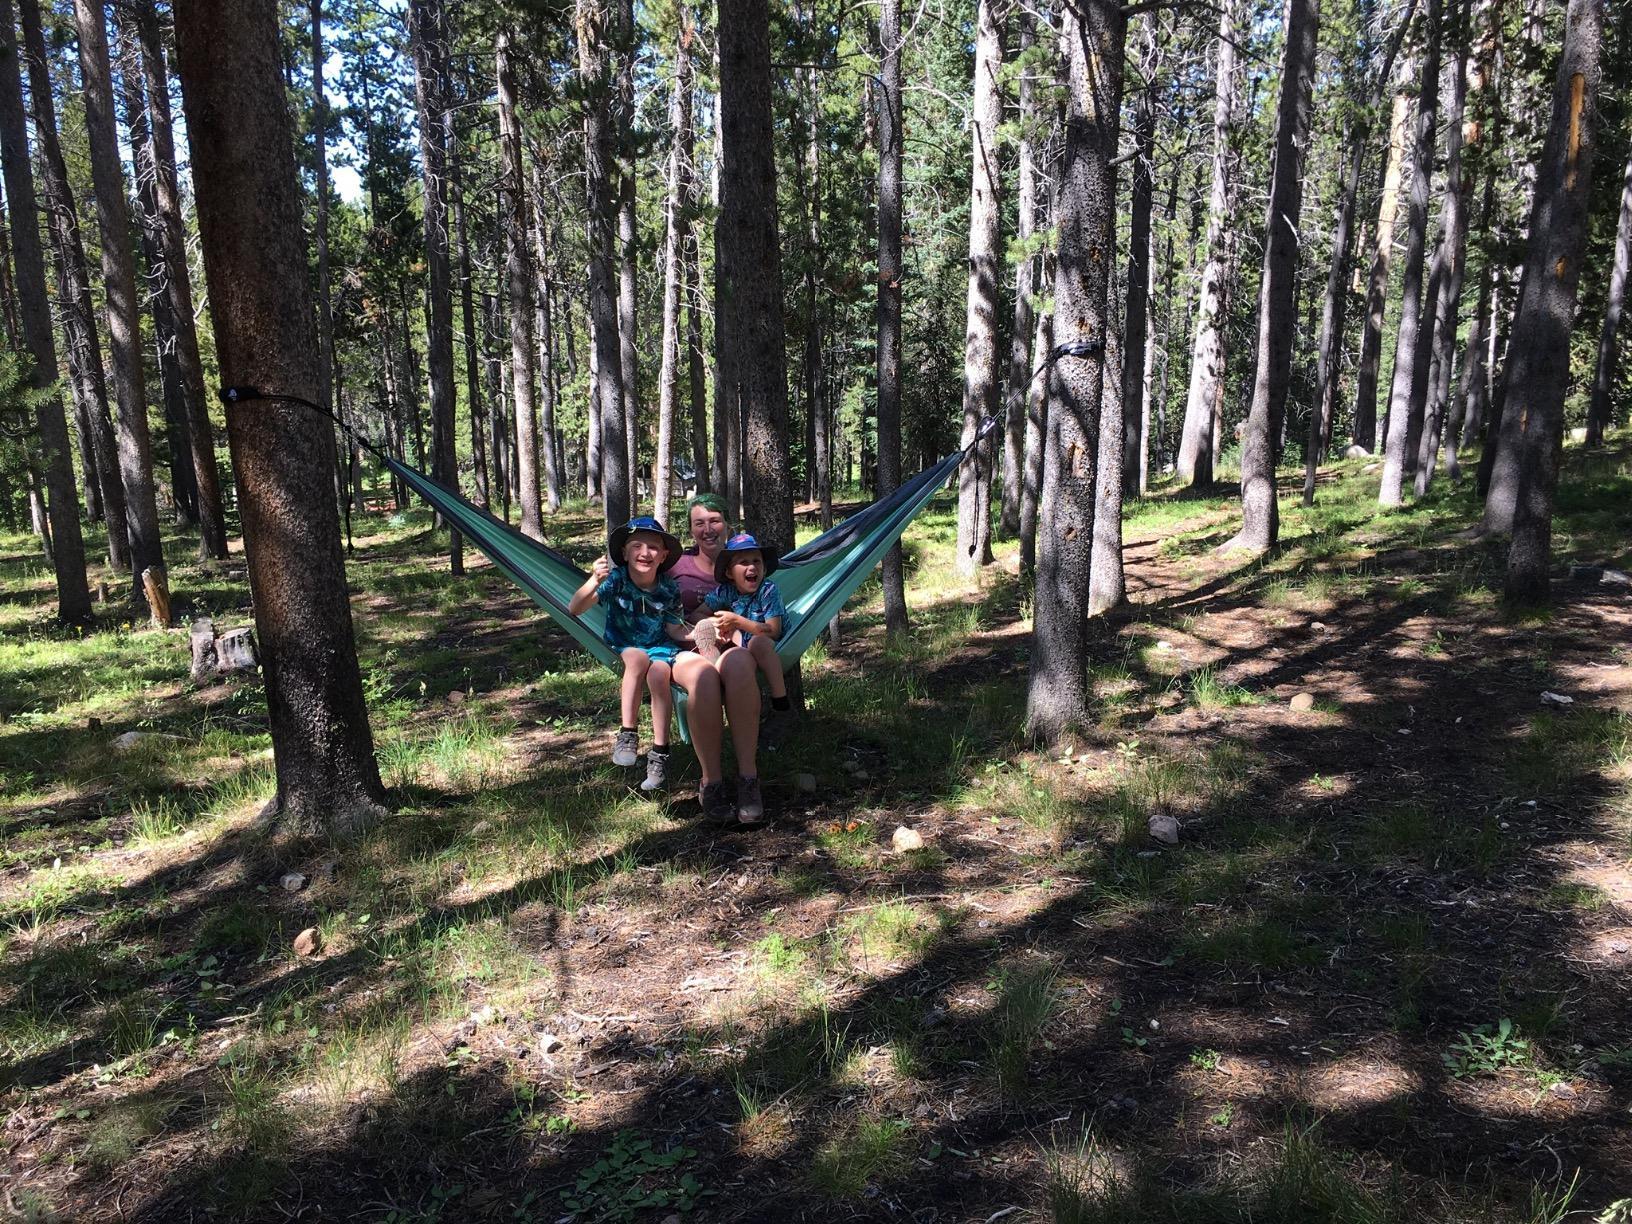 egit Camping - Double Hammock - Lightweight Parachute Portable Hammocks